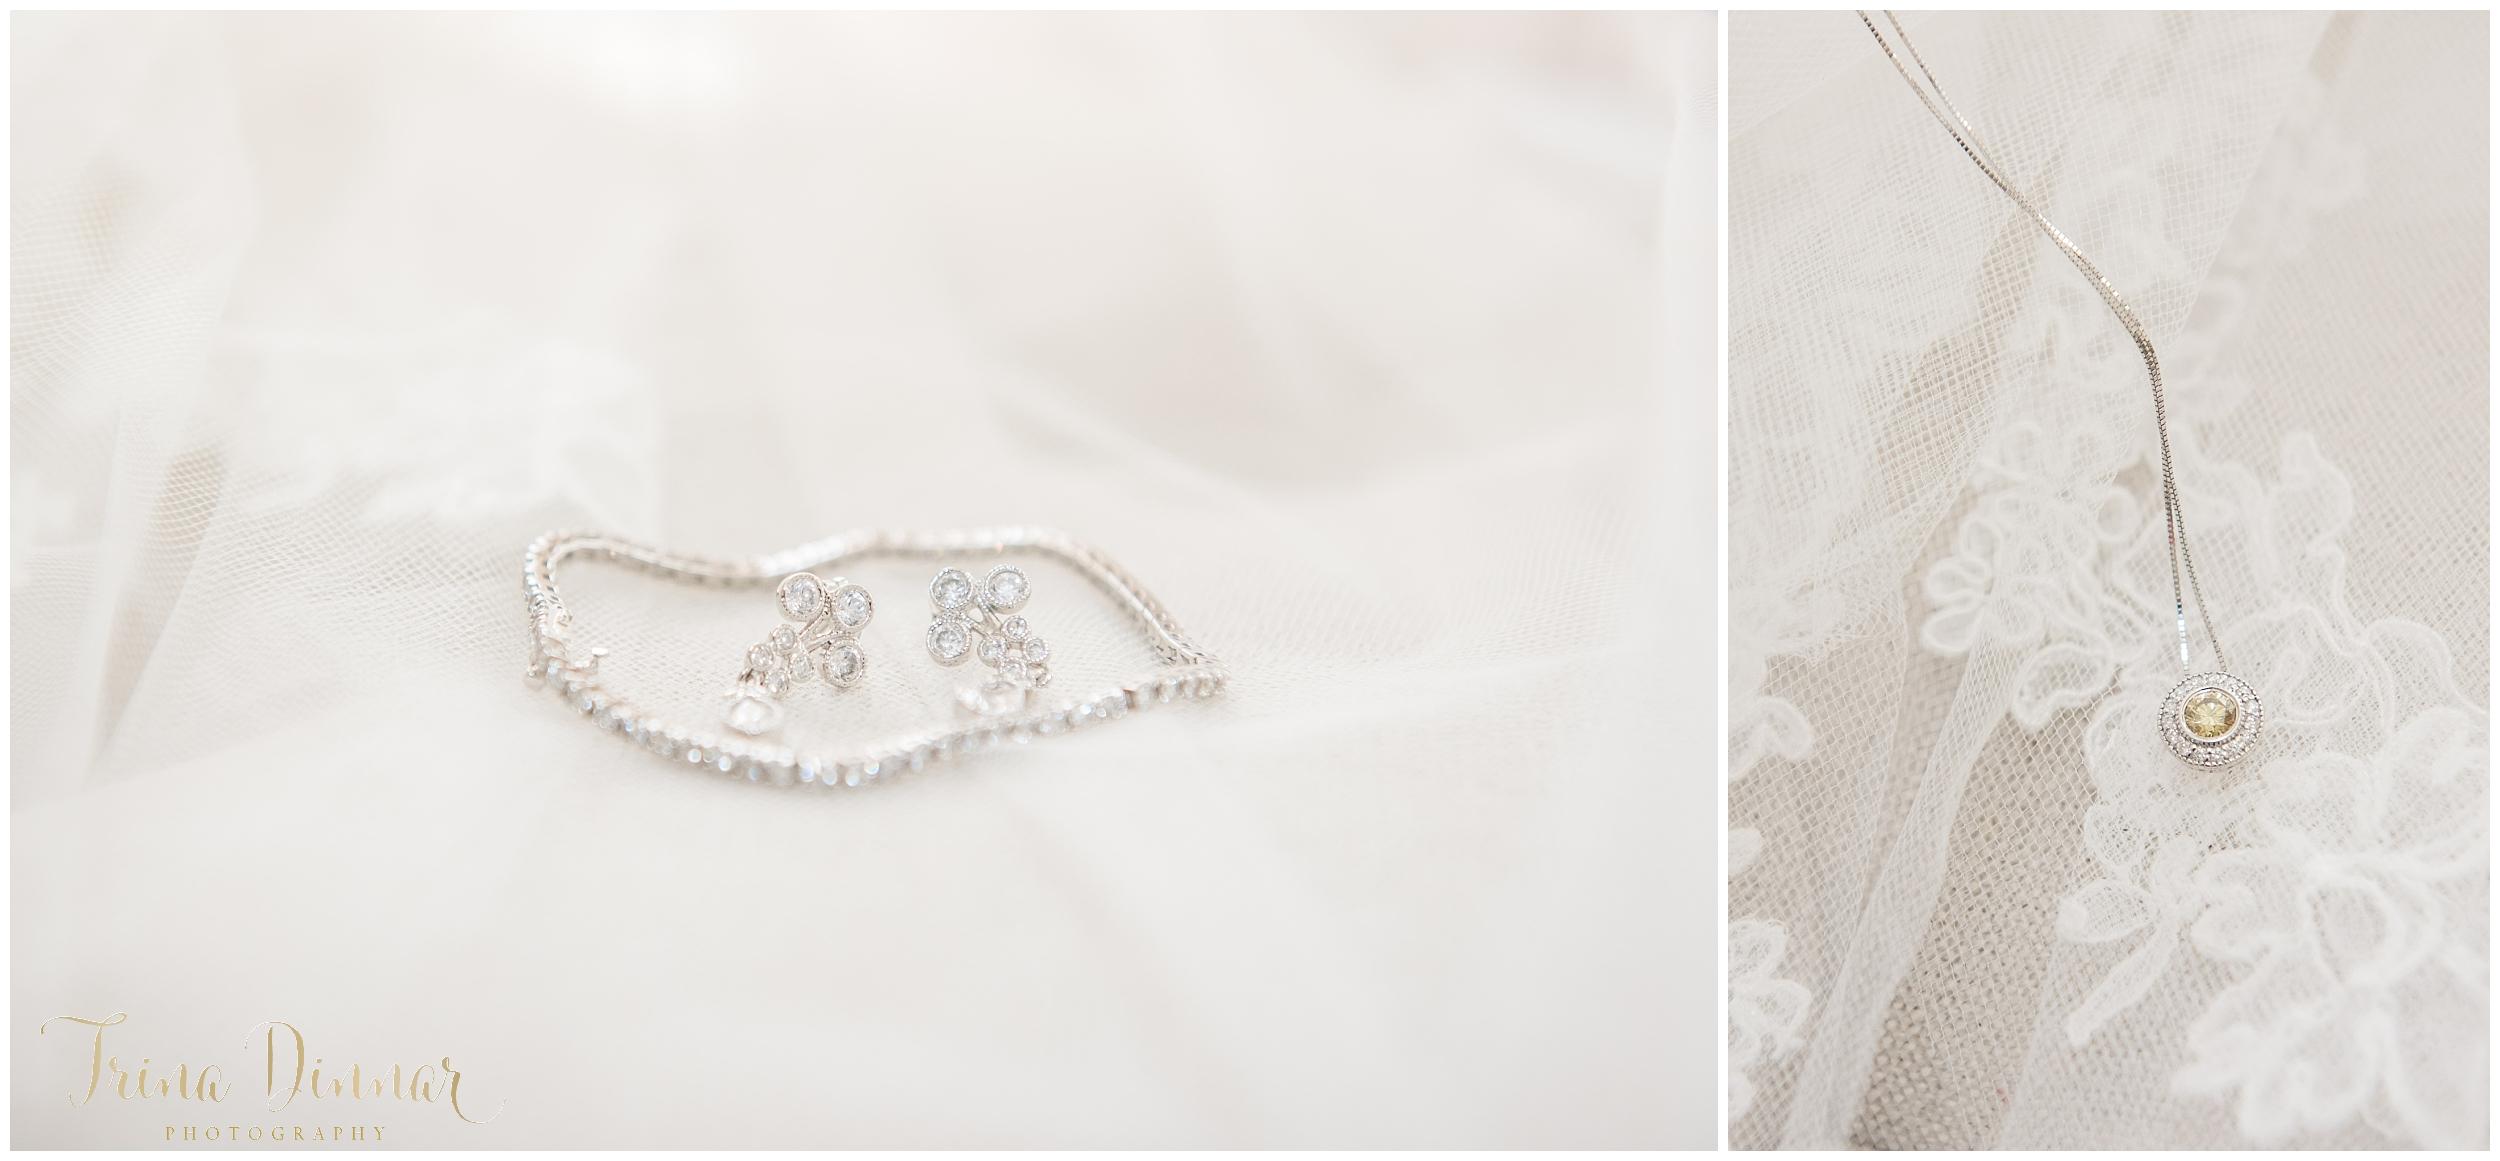 Bridal Jewelry detail photos